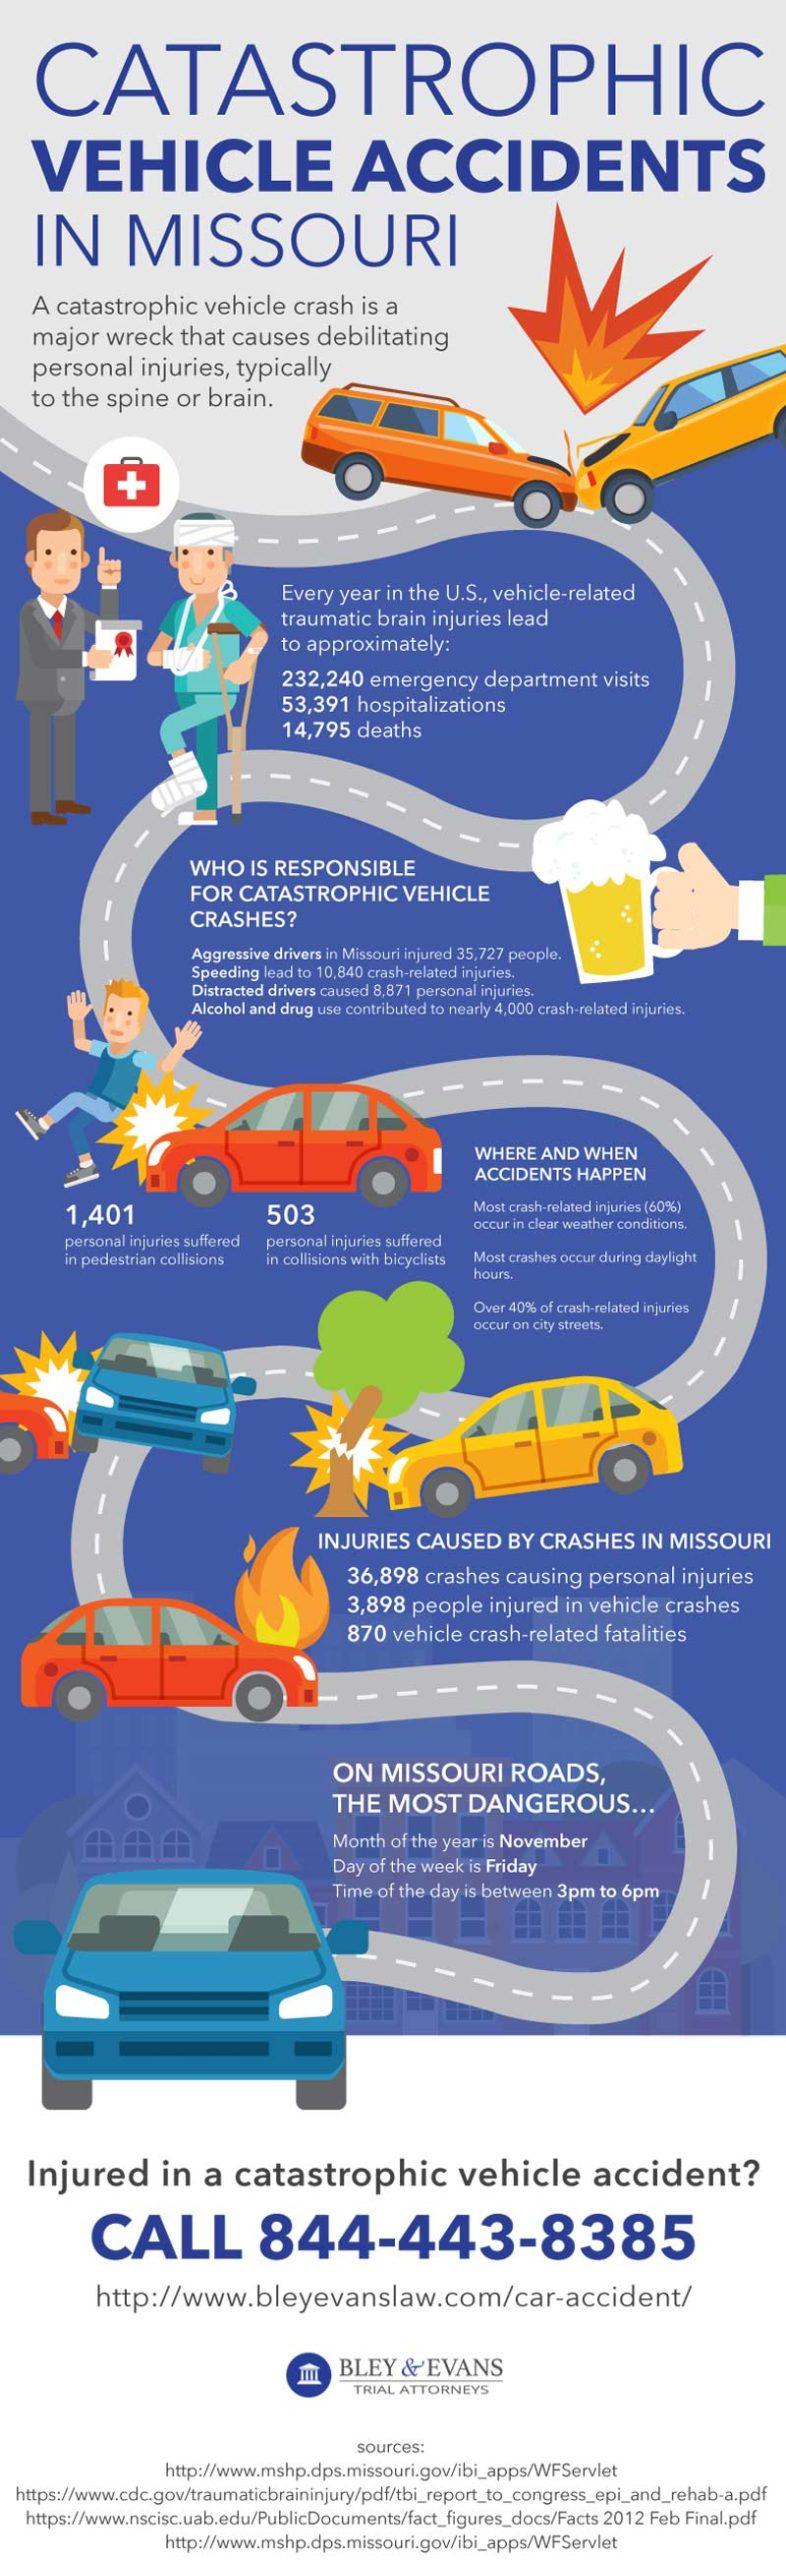 Catastrophic vehicle accident